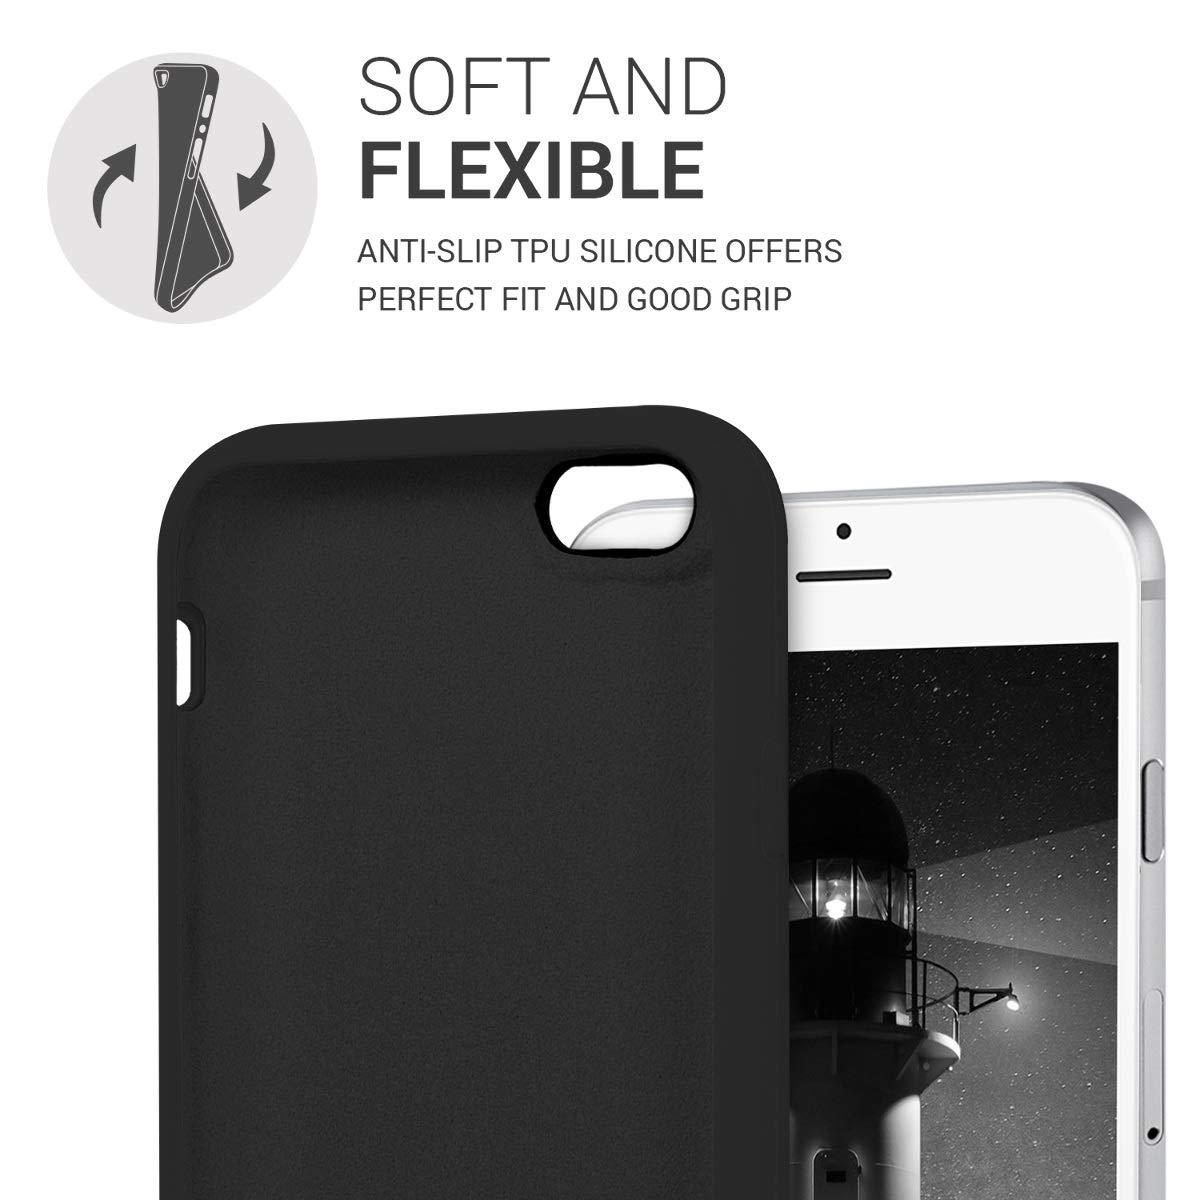 Funda Blanda, Apple, iPhone 6//6S, 11,9 cm , Negro 4.7 kwmobile 40223.47 Funda para tel/éfono m/óvil 11,9 cm Funda Blanda Negro 4.7 Fundas para tel/éfonos m/óviles